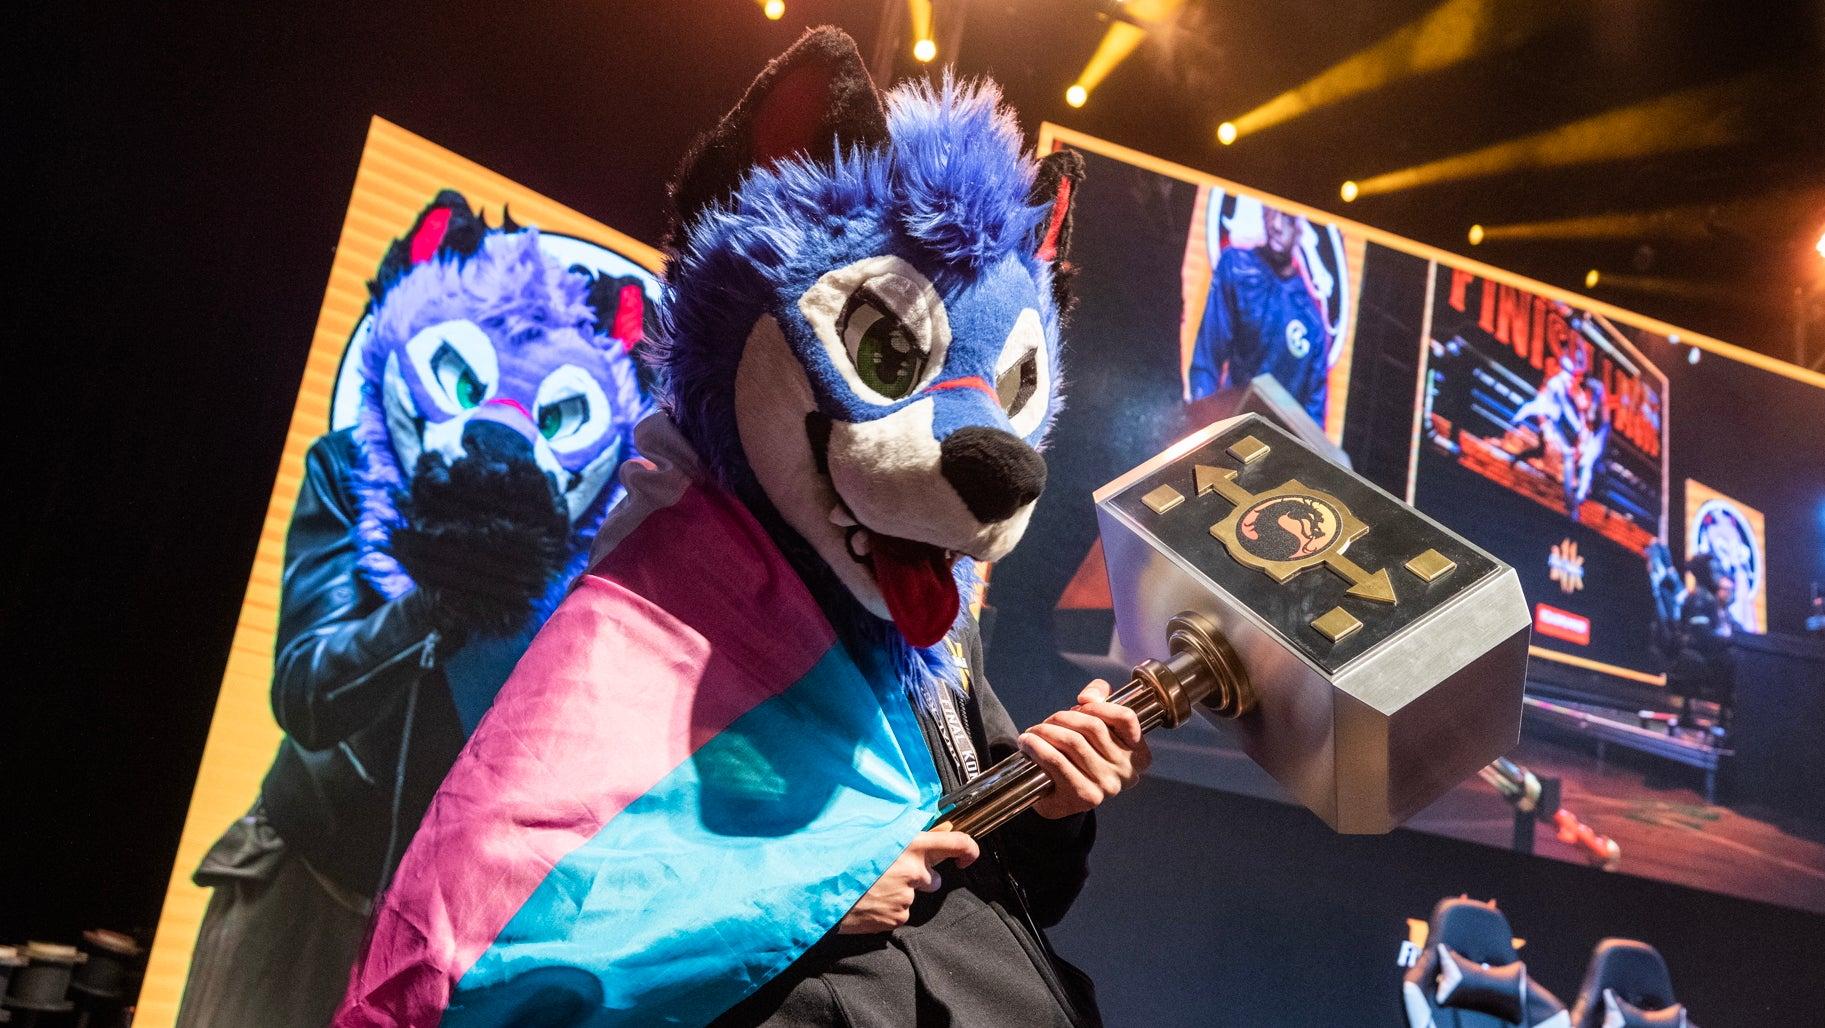 SonicFox Wins Mortal Kombat 11 Championship, Shouts Out Bernie Sanders